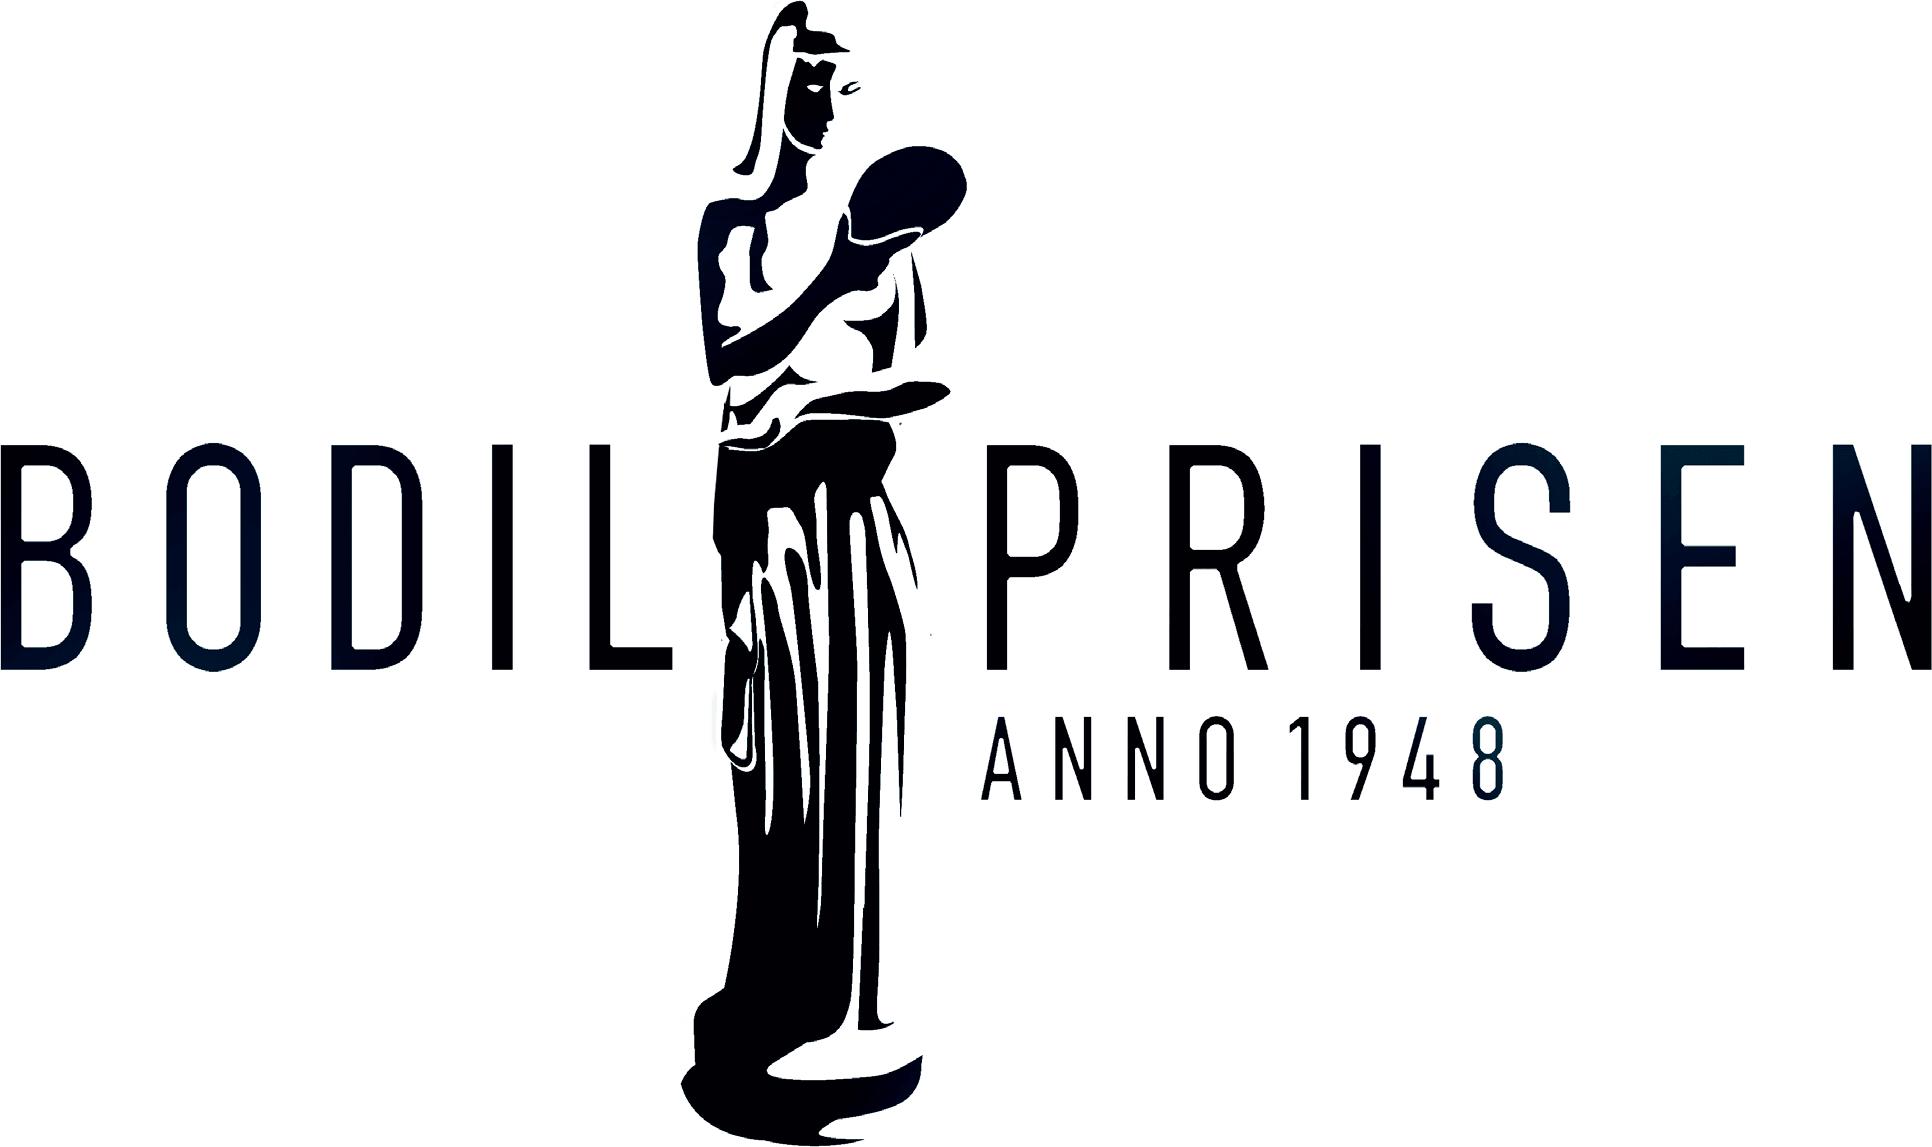 Bodilprisen - Danske Filmkritikere